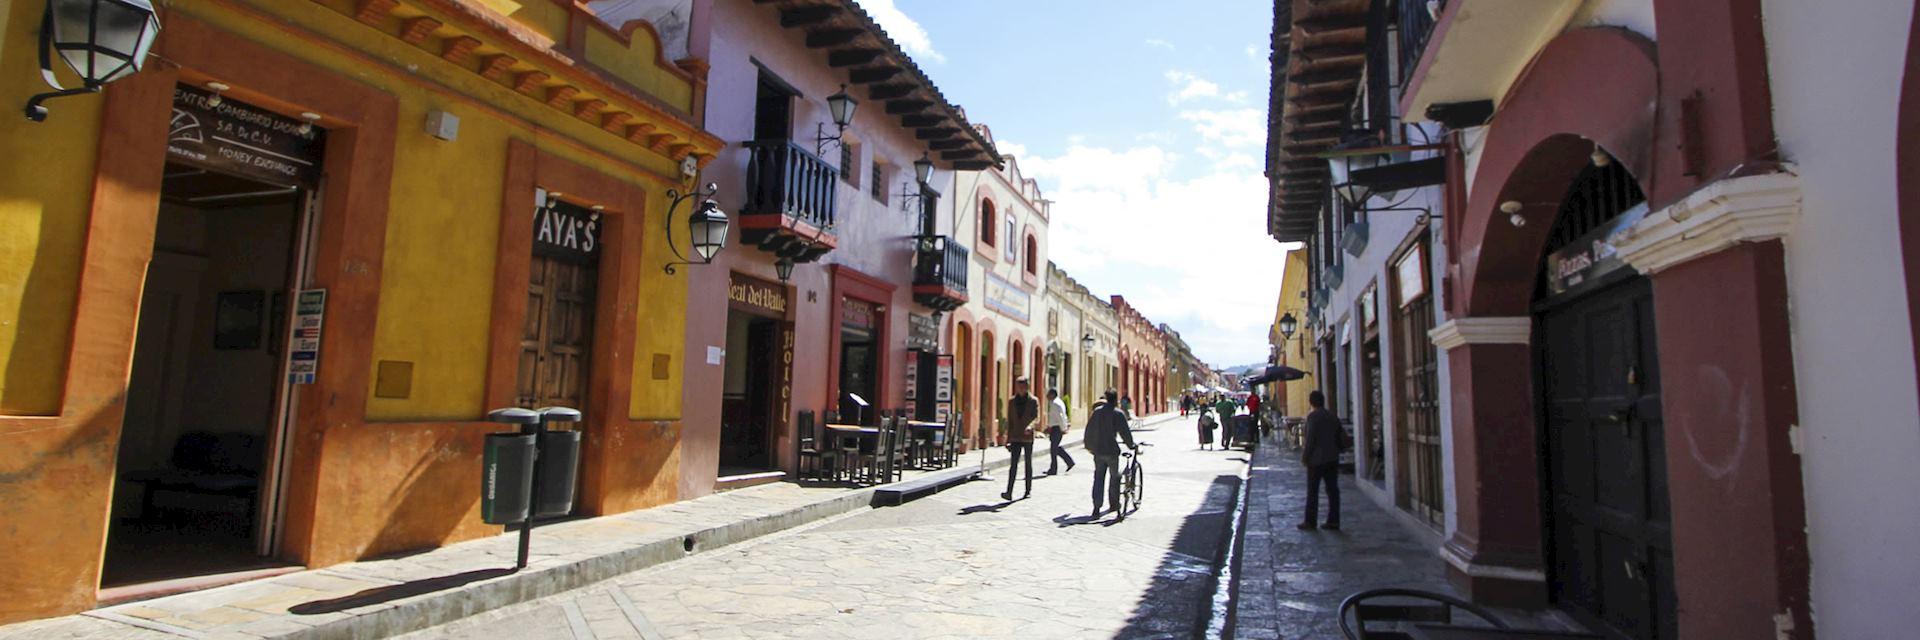 A street in San Cristóbal de las Casas